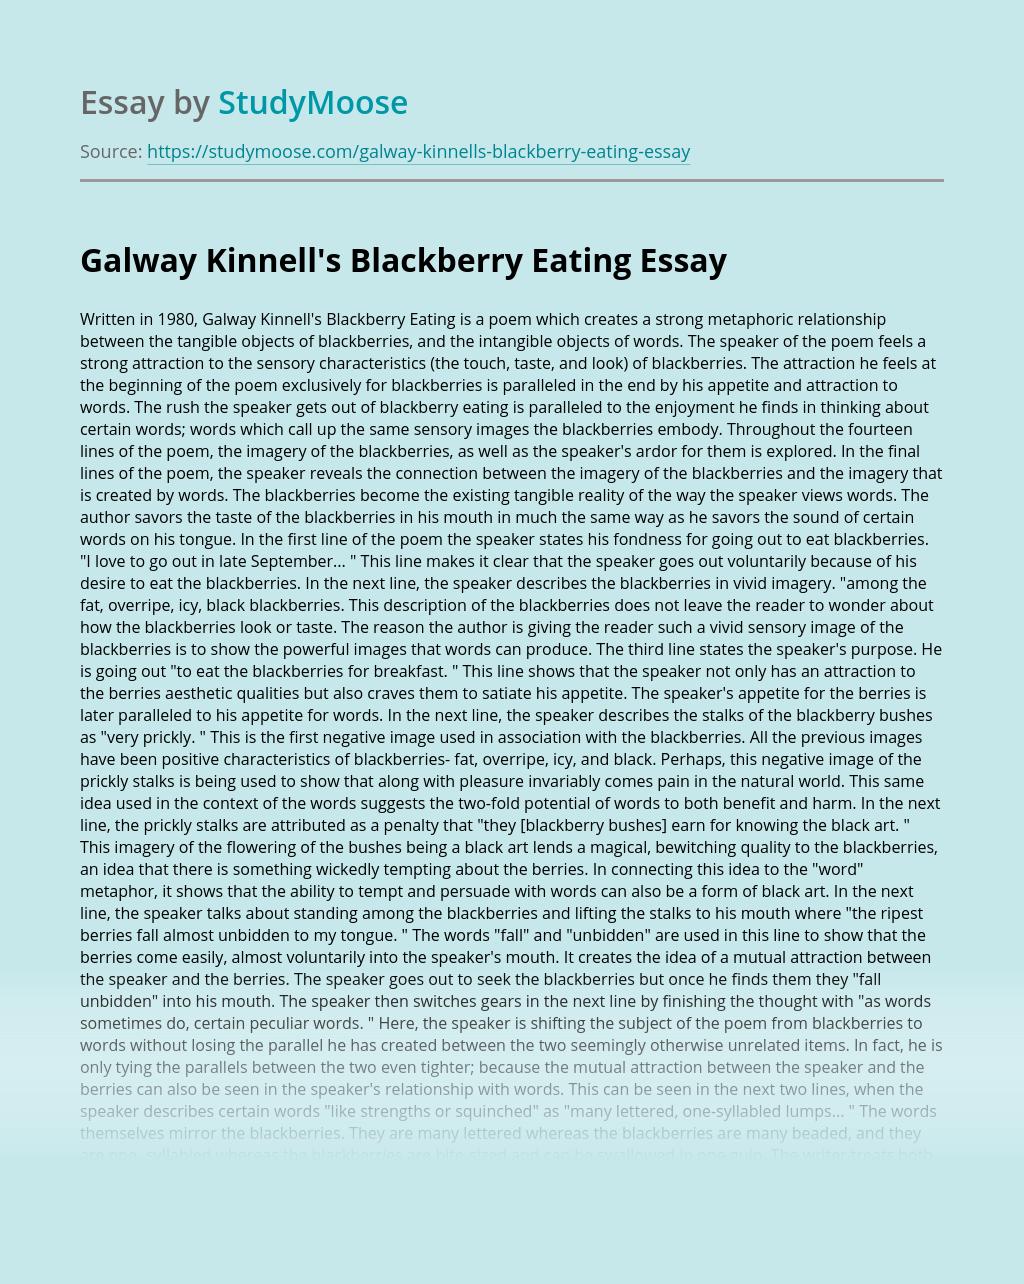 Galway Kinnell's Blackberry Eating